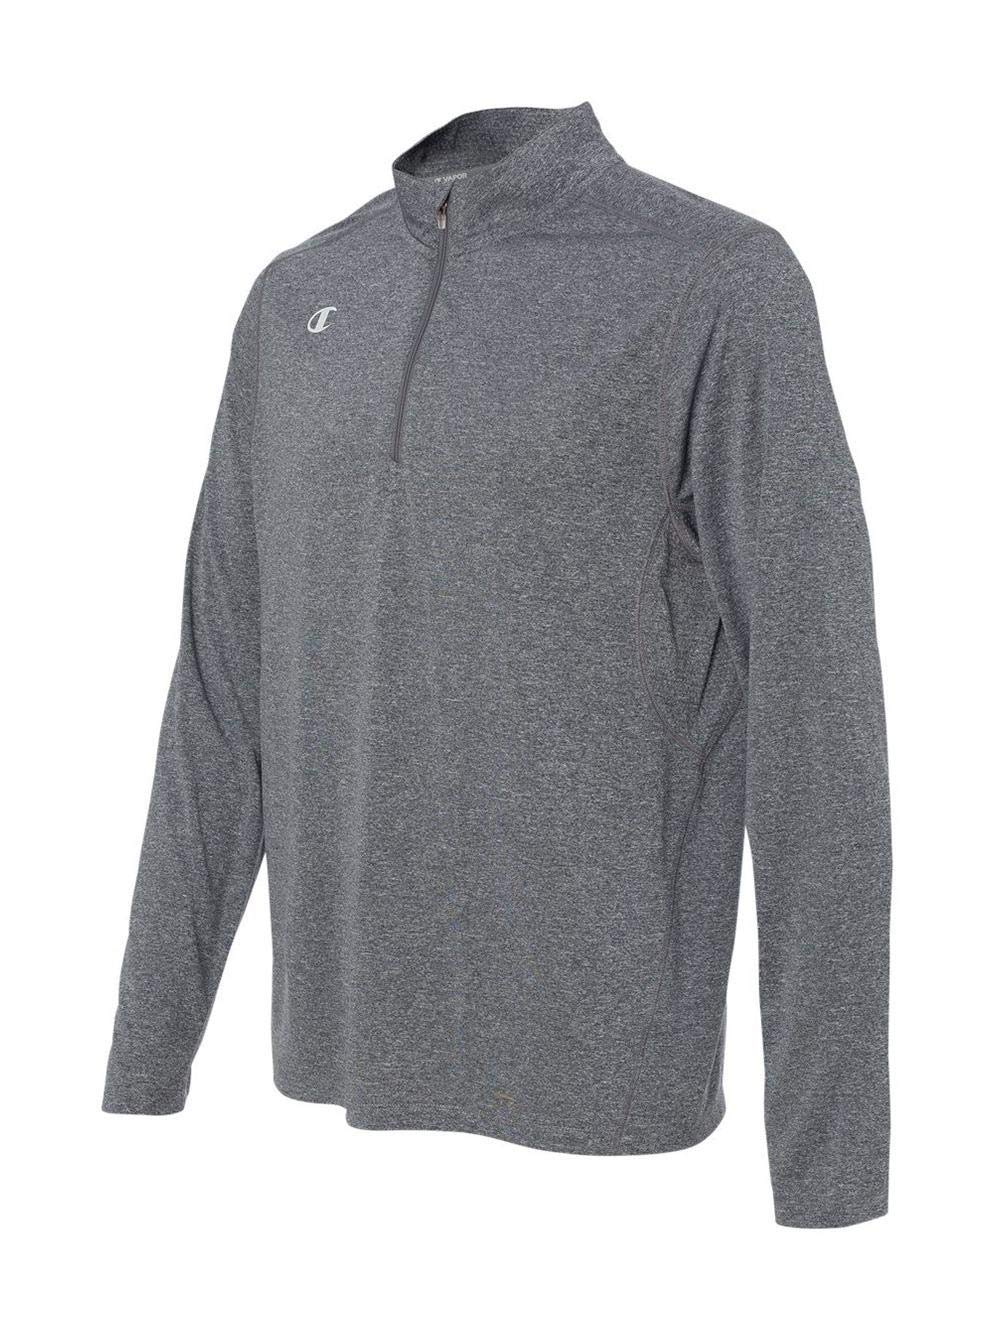 Champion Men's Quarter-Zip Double Dry Pullover, Slate Grey Heather, Medium by Champion